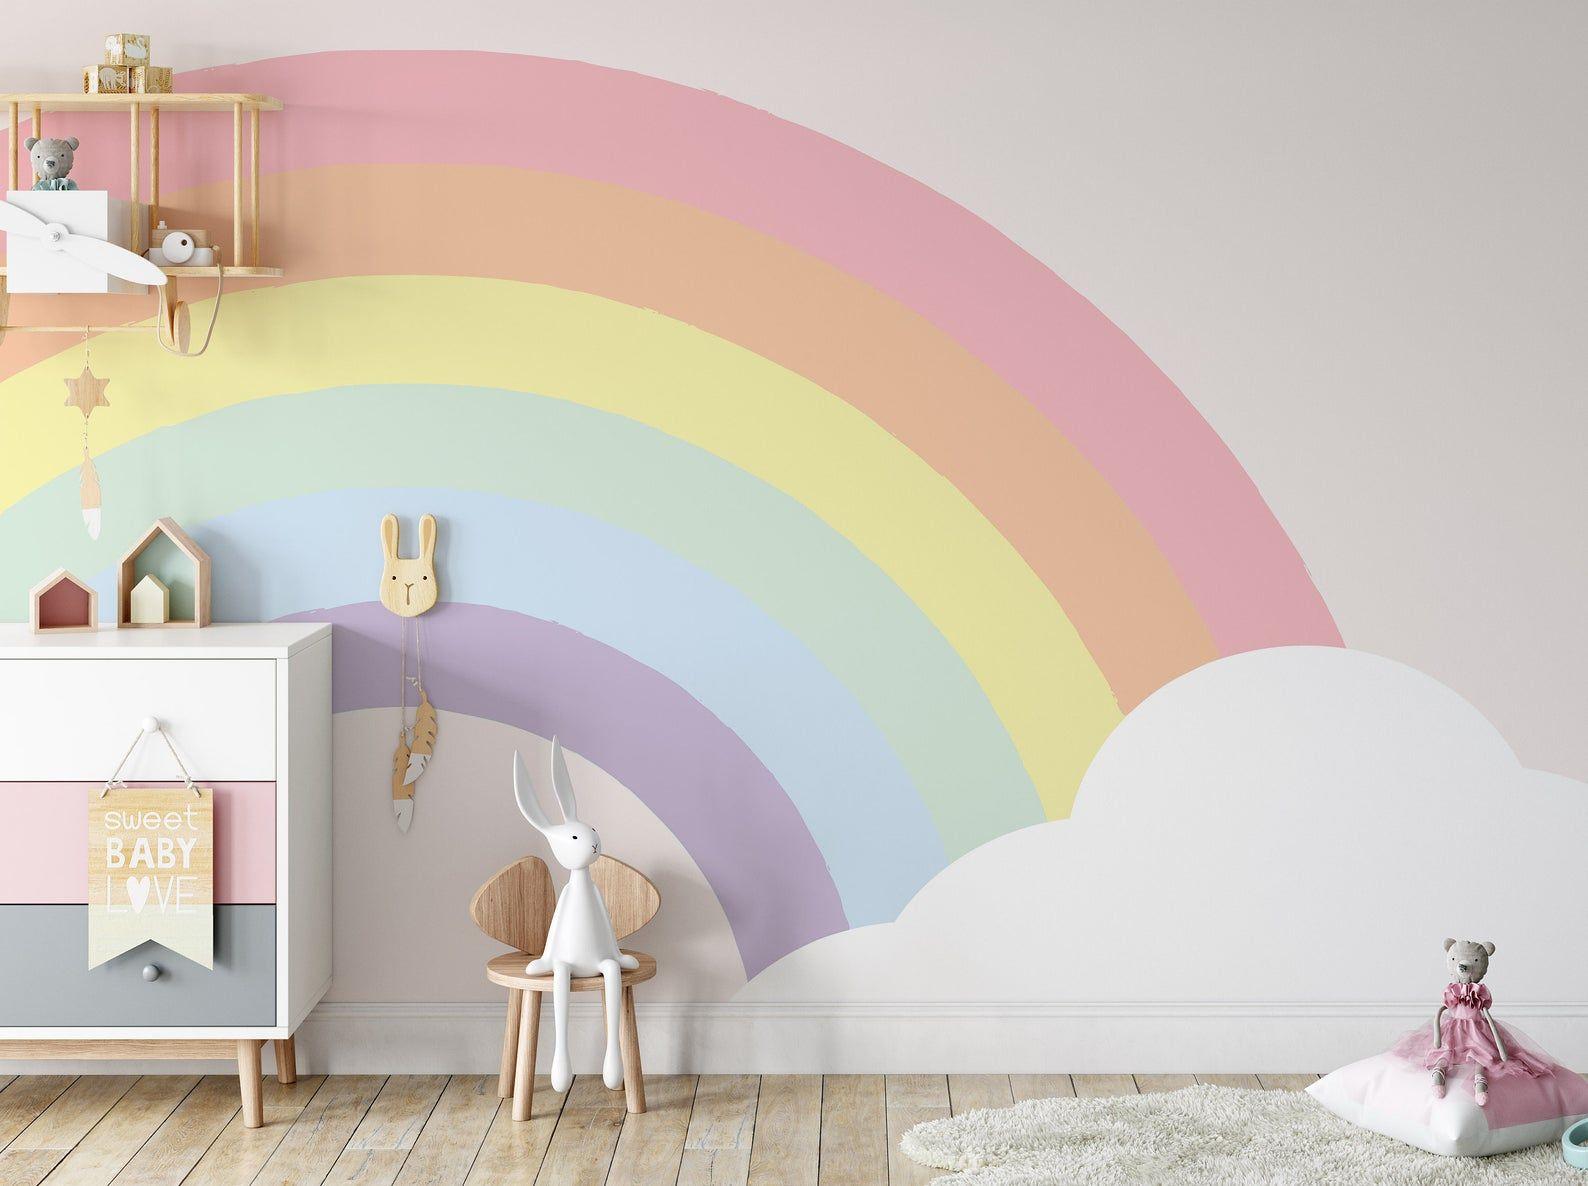 Half Rainbow And Cloud Background Wallpaper Self Adhesive Peel And Stick Wall Decoration Minimalistic Scandinavian Removable Rainbow Room Kids Kids Room Murals Rainbow Girls Room